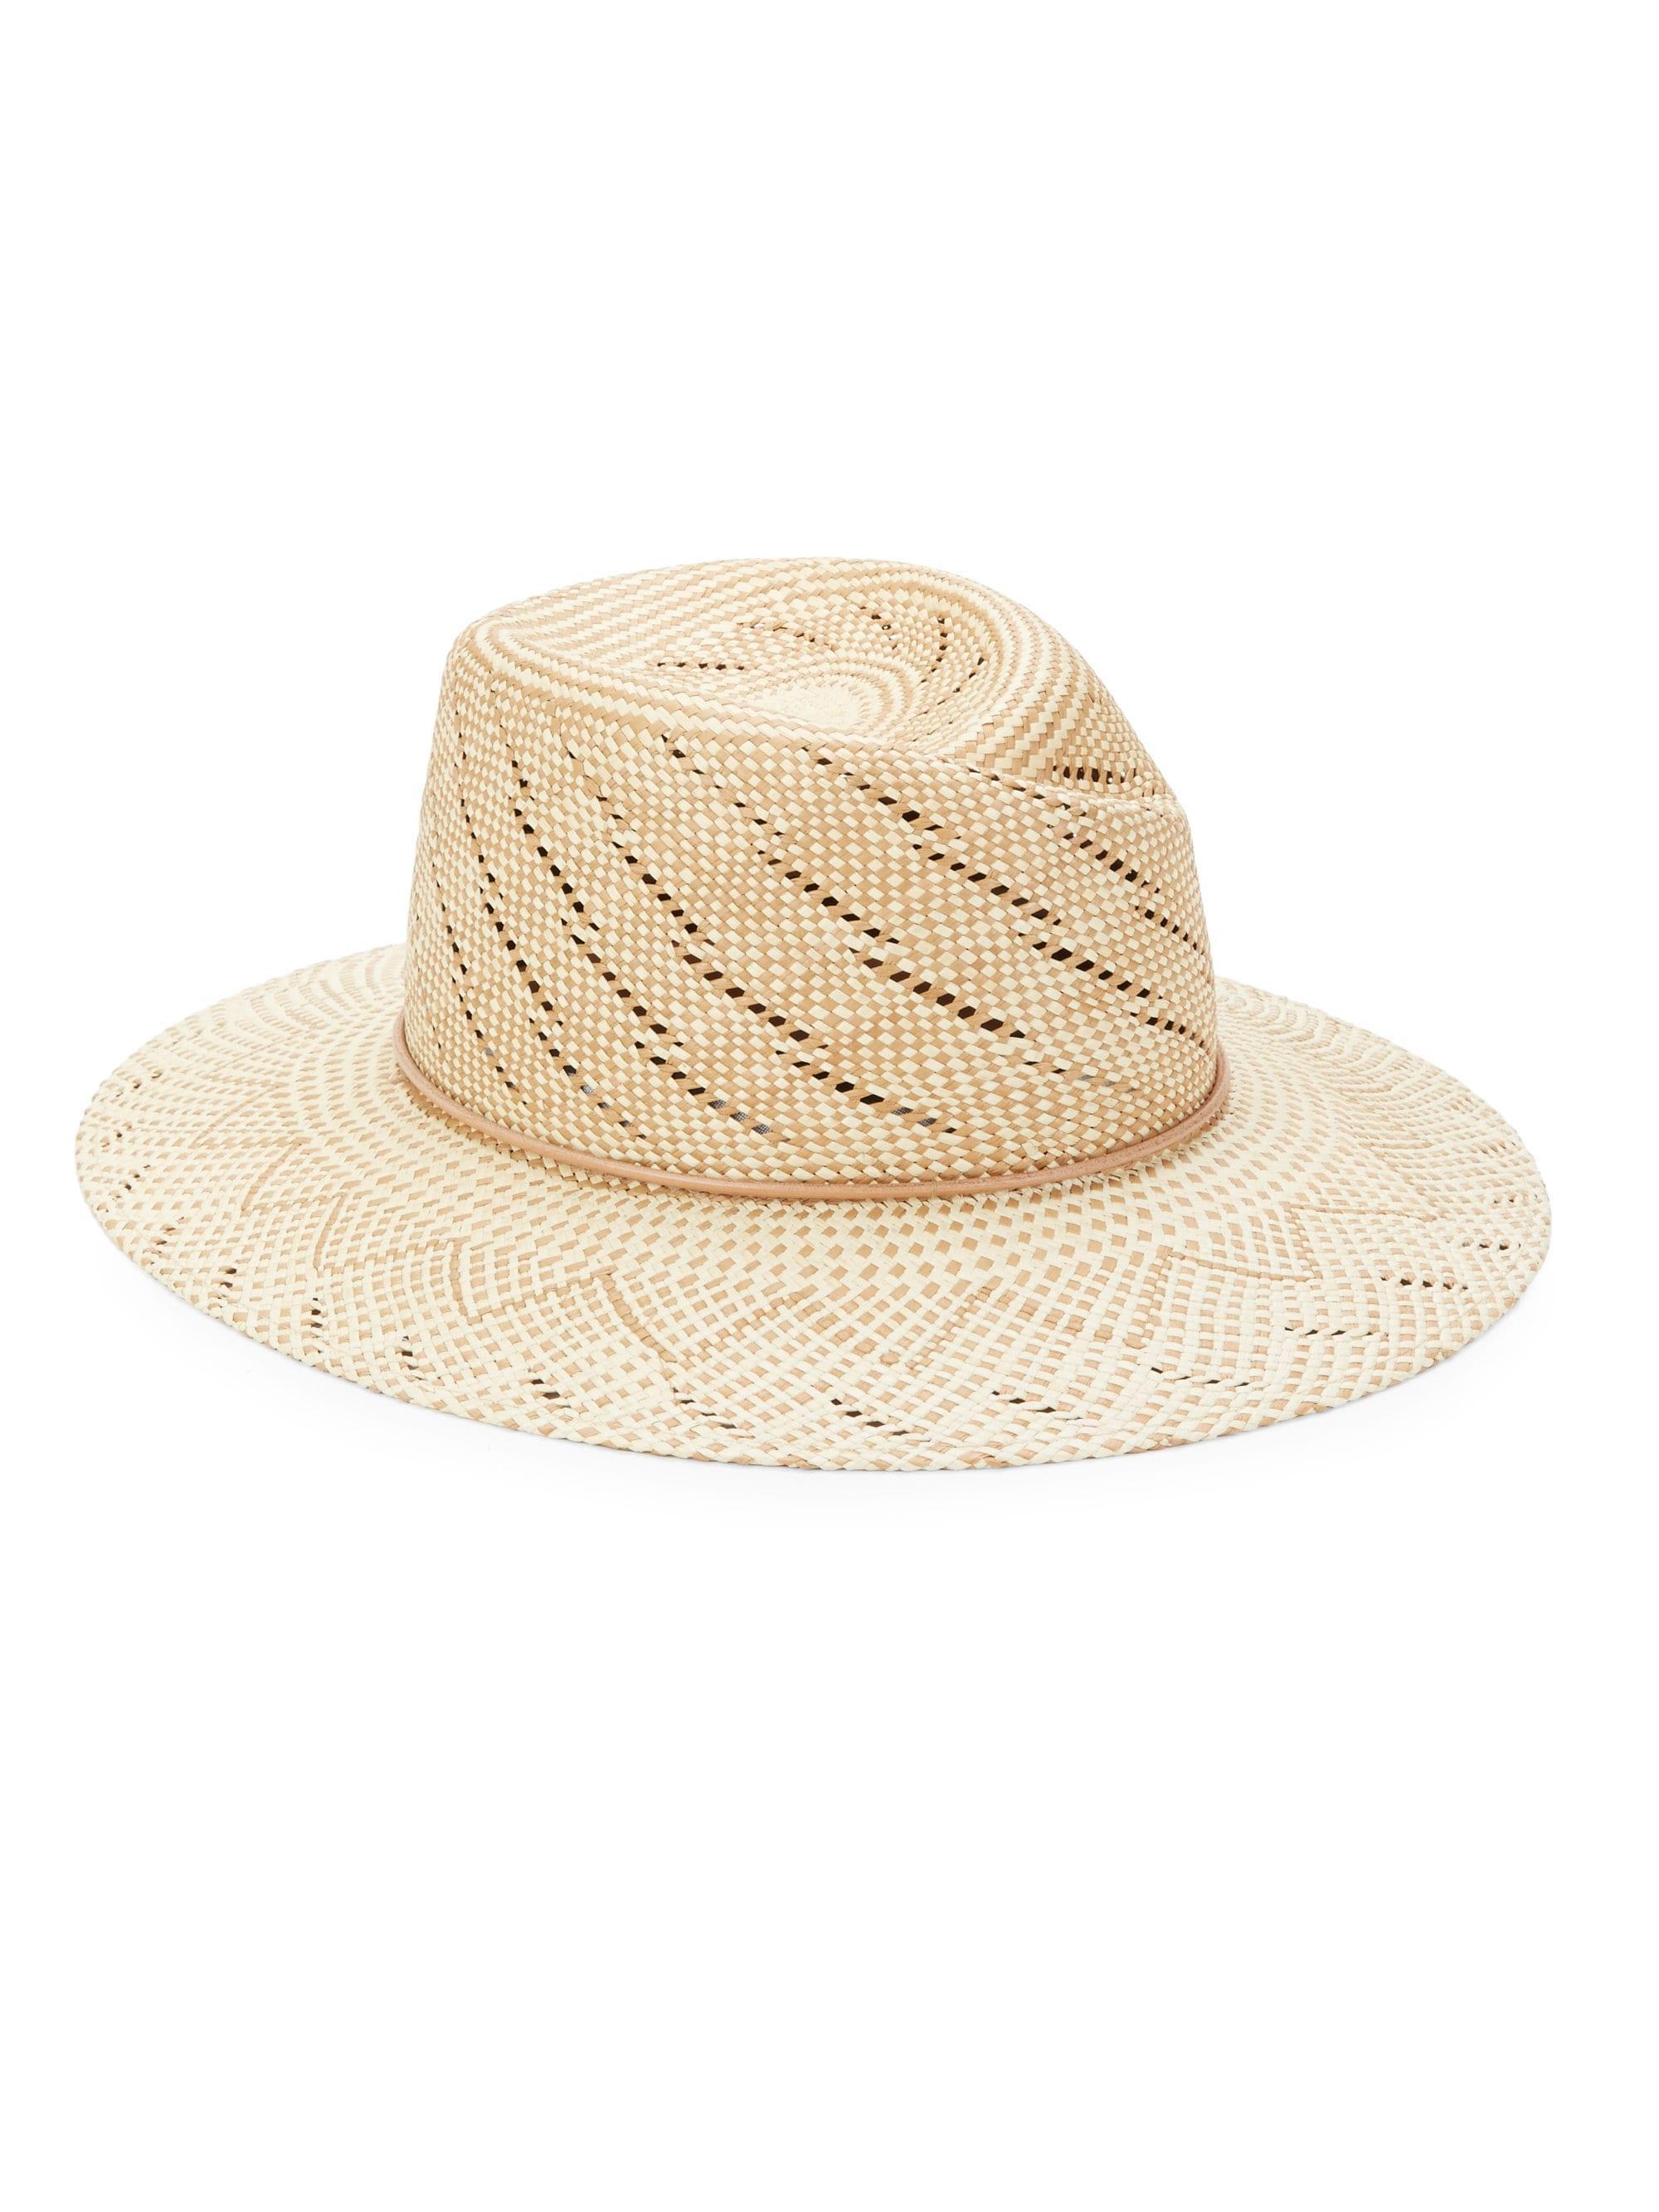 Lyst - Rag   Bone Women s Zoe Straw Hat - Taupe Multi - Size Small ... aabd14f7f40